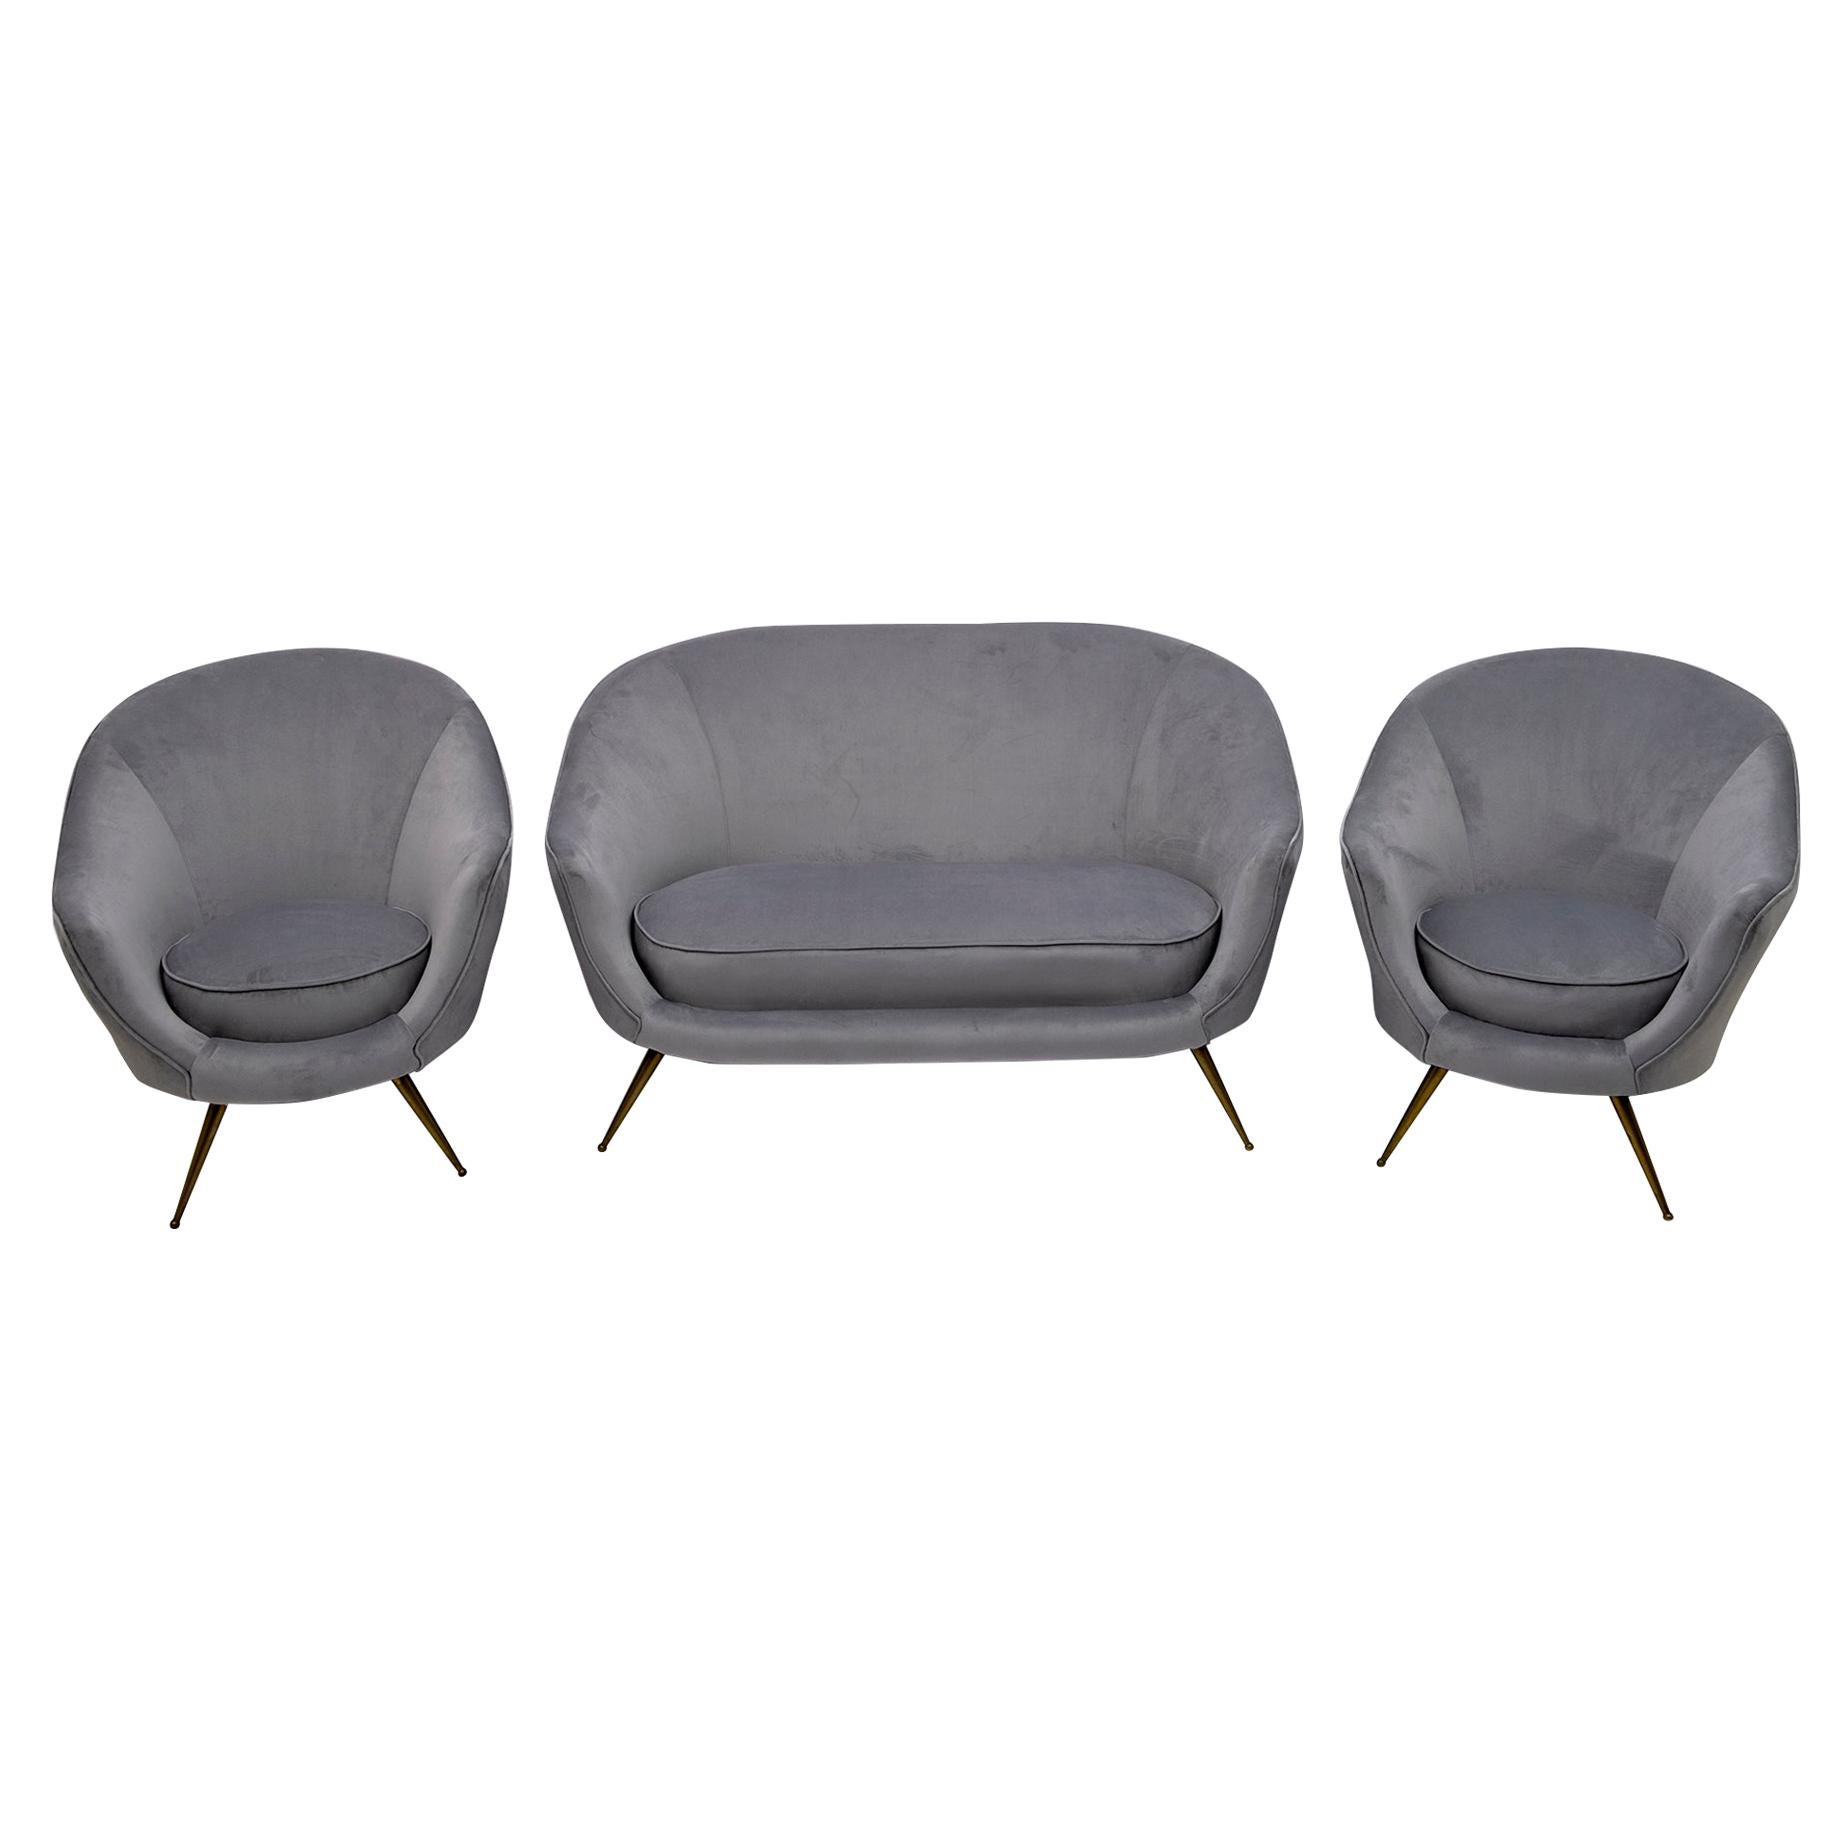 Federico Munari Mid-Century Modern Italian Curved Sofa and Two Armchairs, 1950s